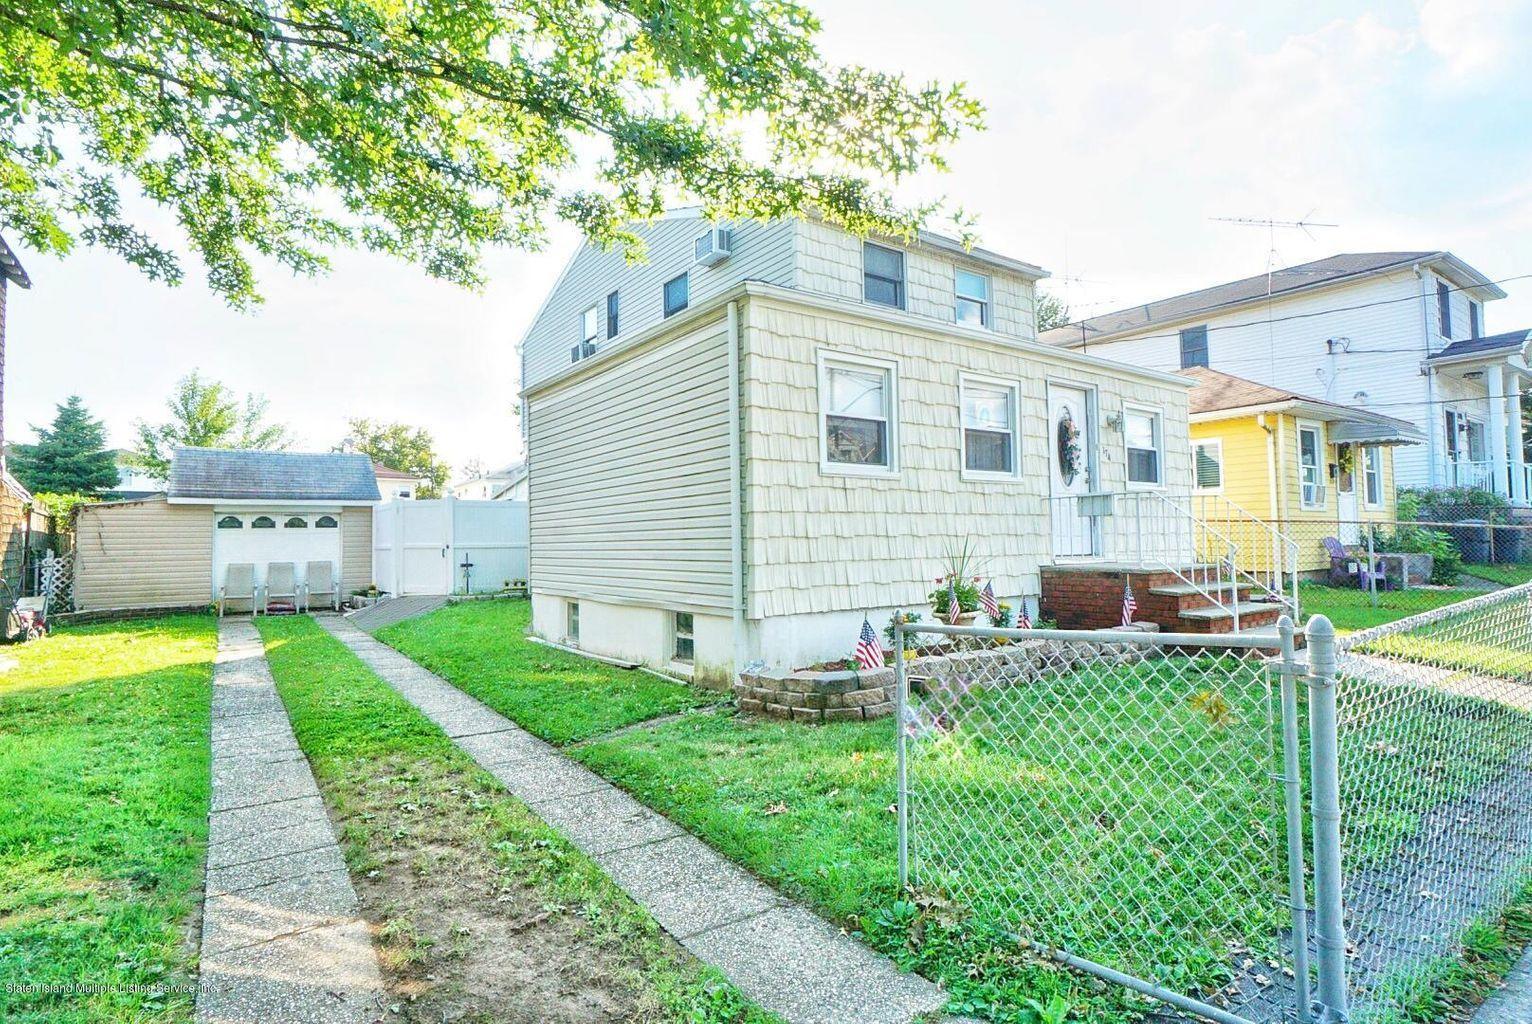 Single Family - Detached 174 Wiman Avenue  Staten Island, NY 10308, MLS-1145983-4